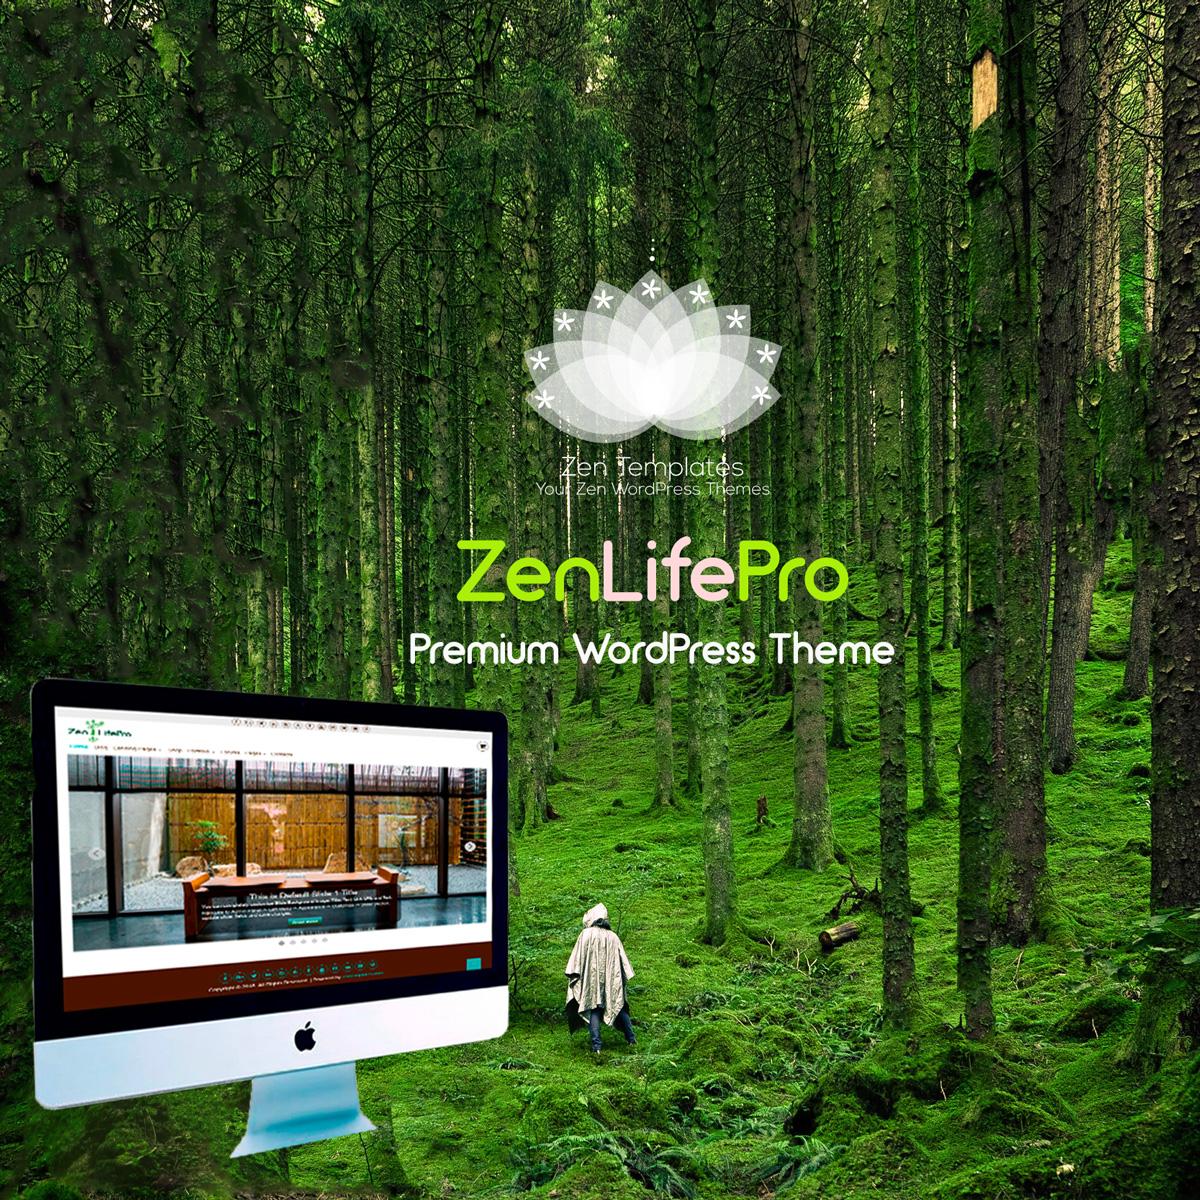 ZenLifePro-premium-wordpress-theme-mockup